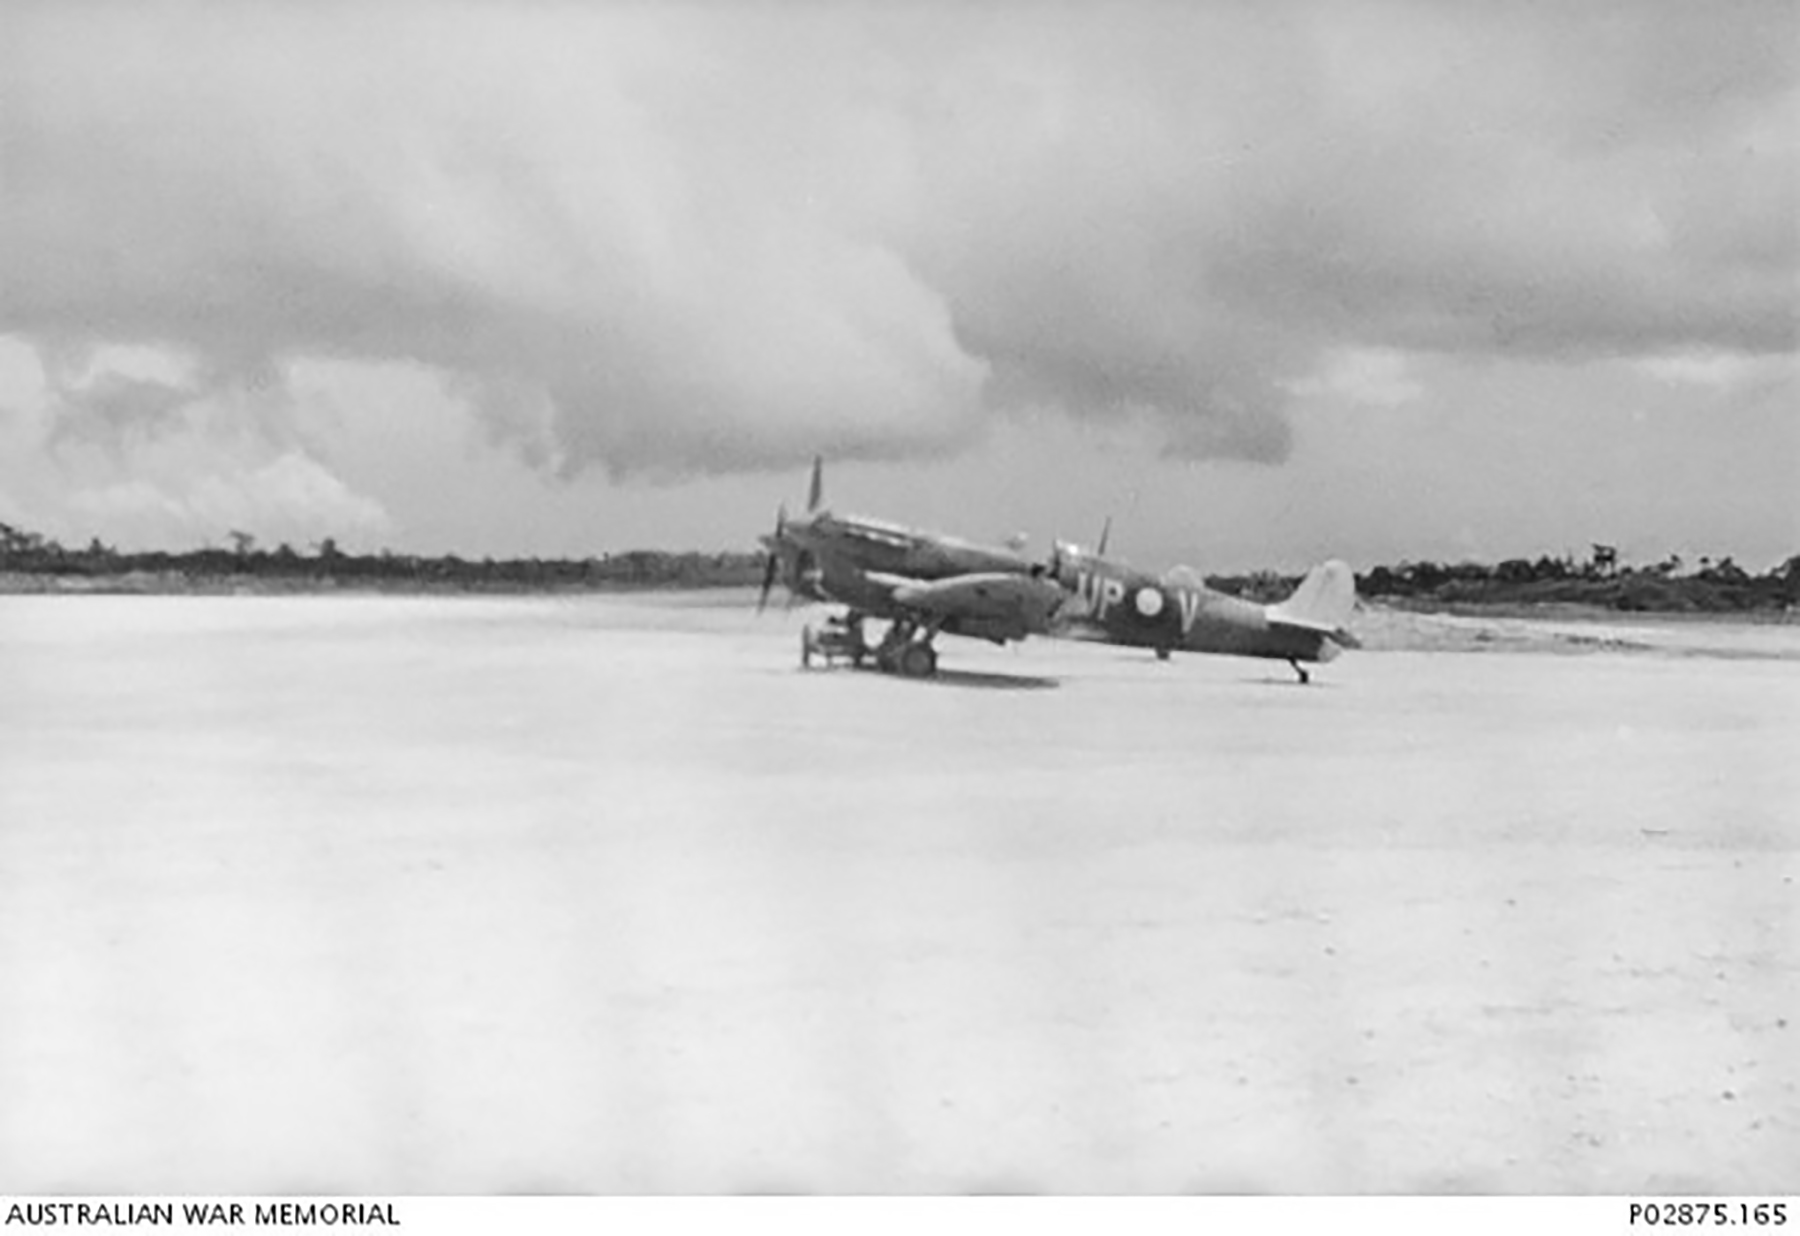 Spitfire MkVc RAAF 79Sqn UPV A58 145 RAF EE852 Kiriwina Sep 1943 AWM 02